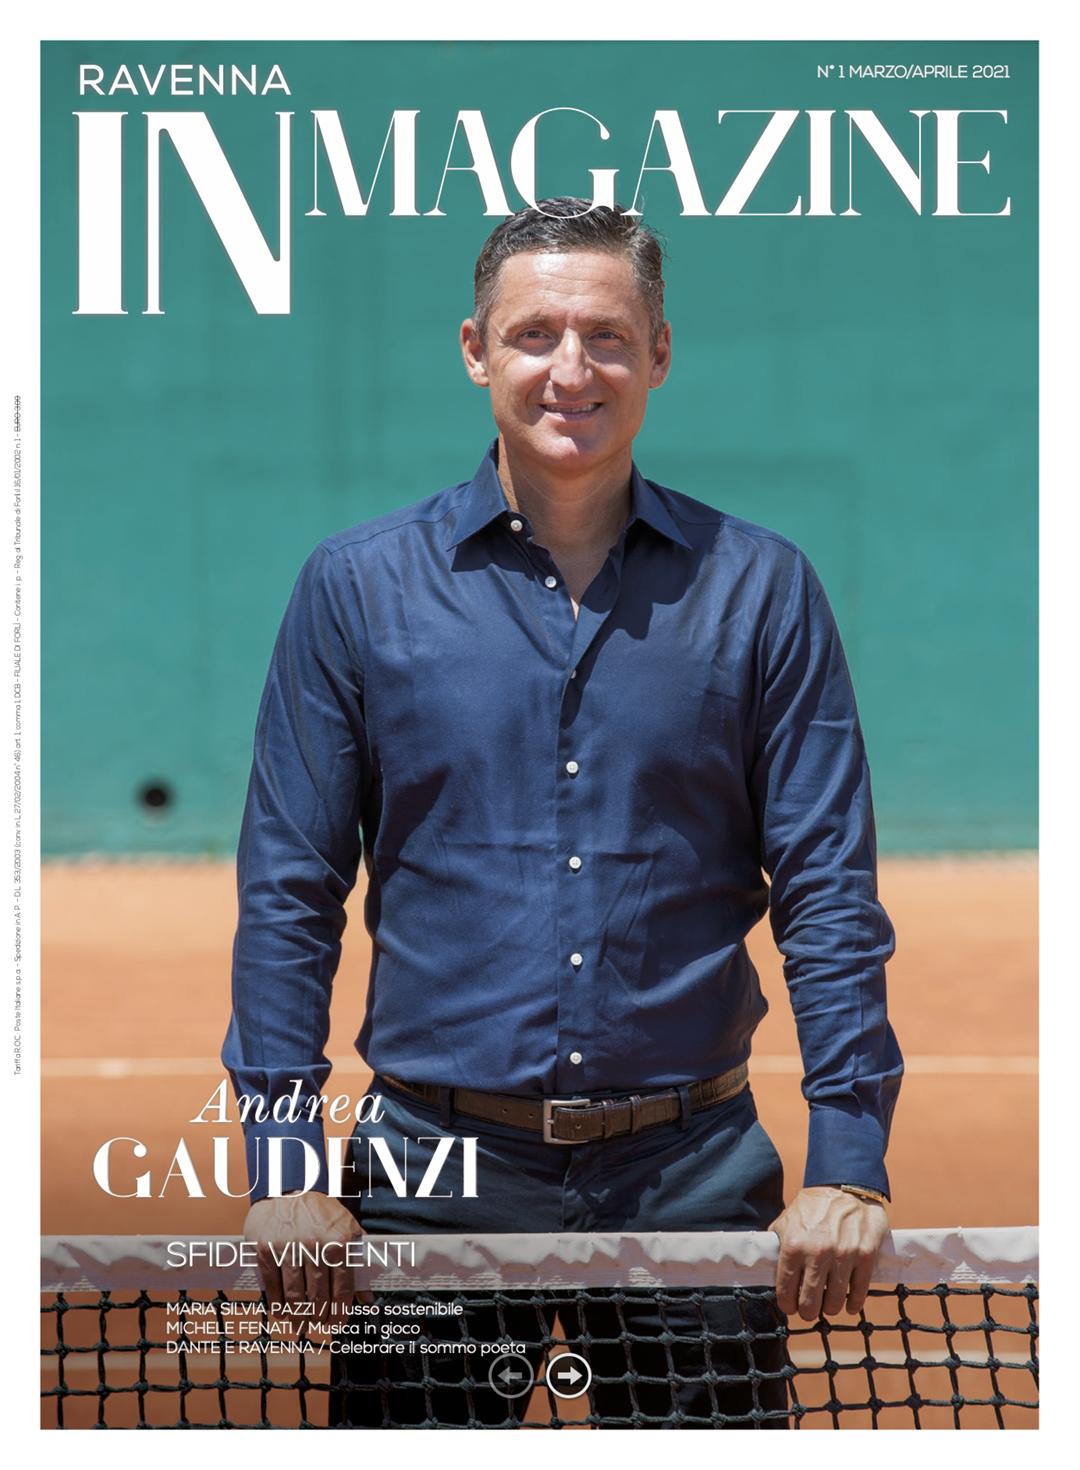 Andrea Gaudenzi in copertina su Ravenna IN Magazine n. 1-2021